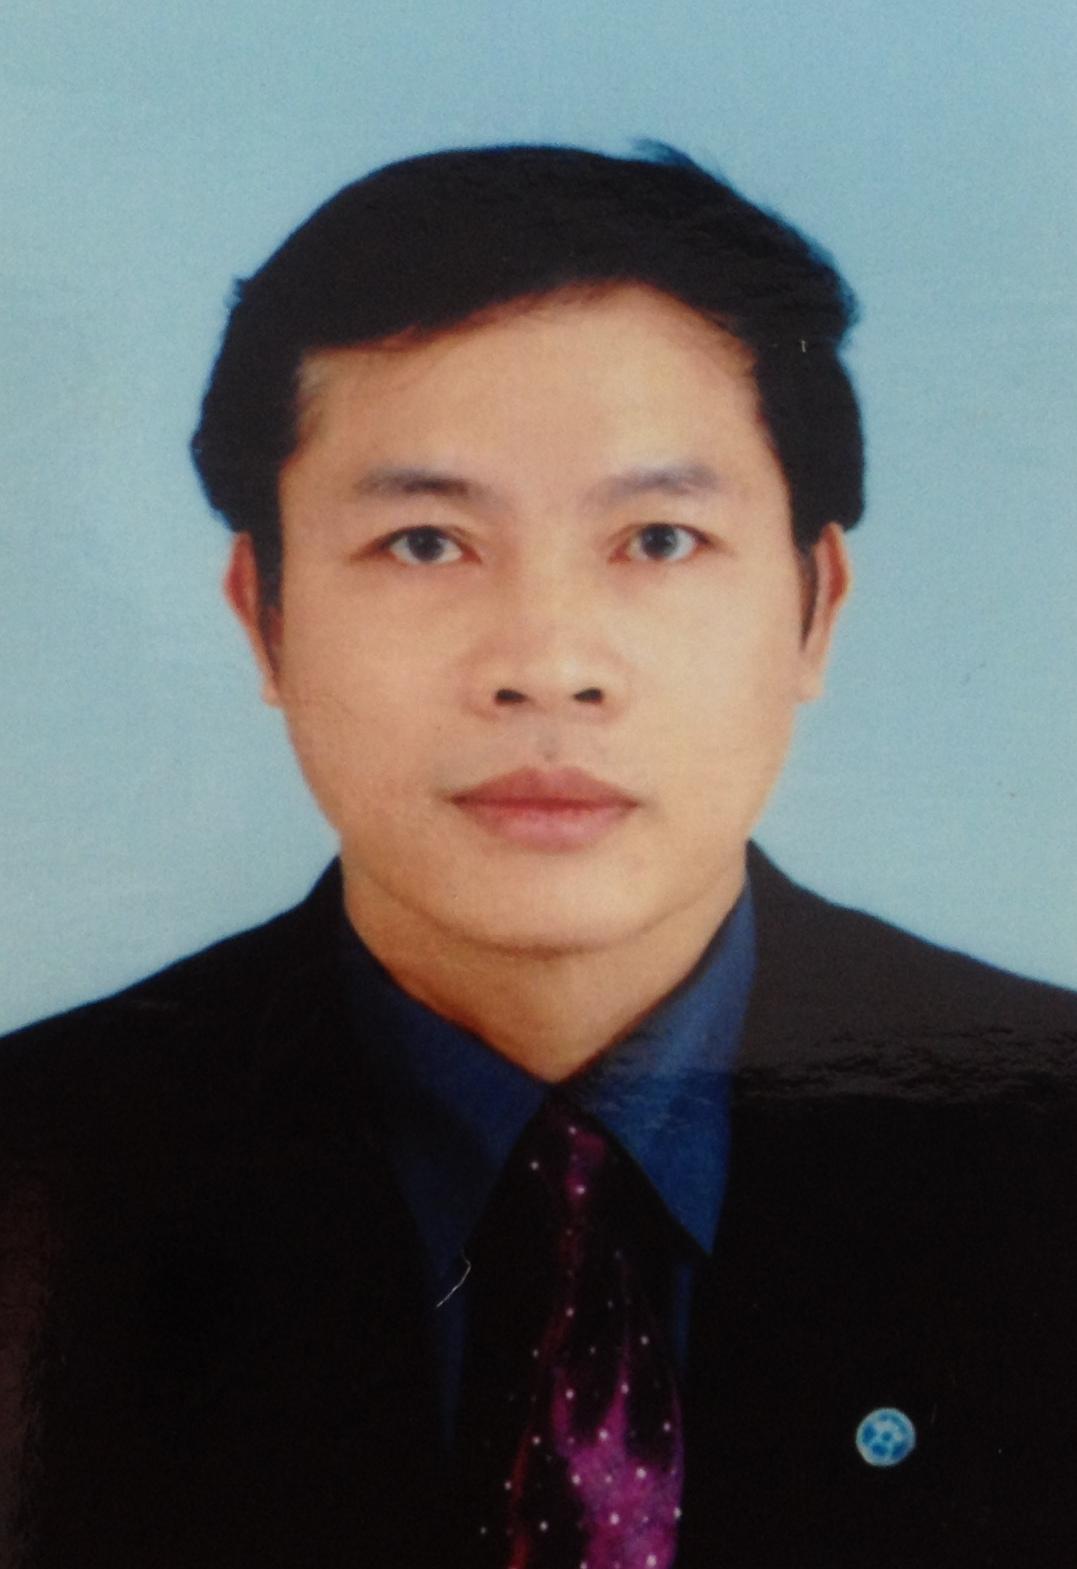 Nguyễn Song Dũng